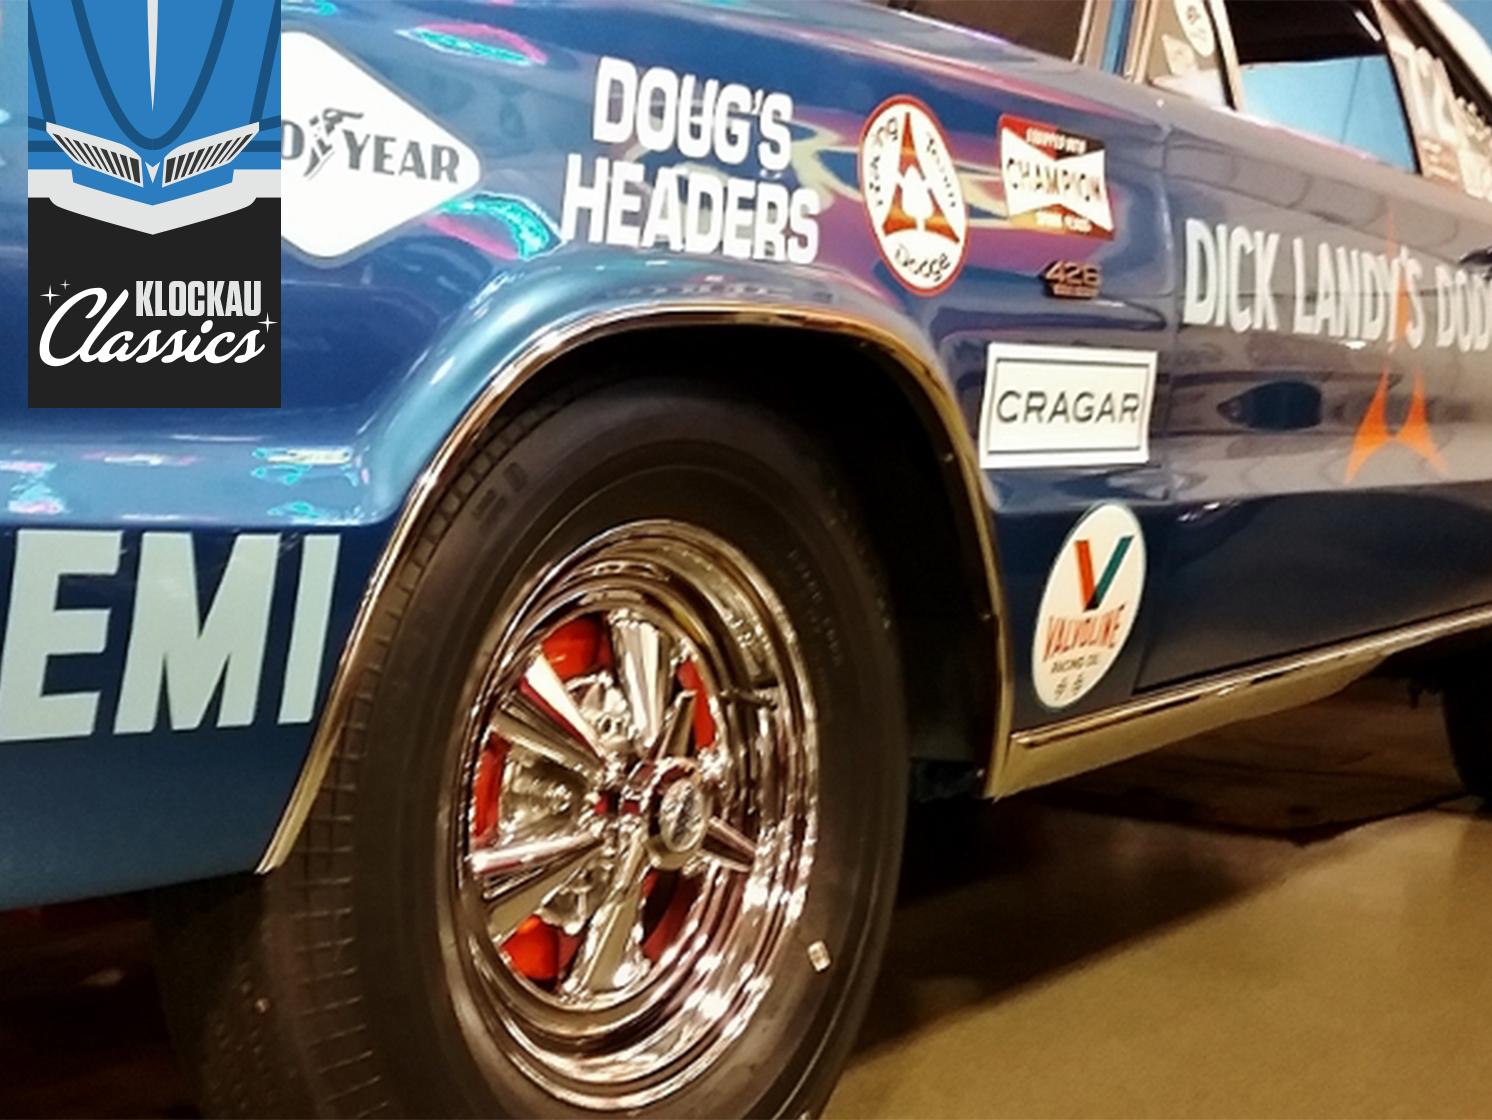 1967 Dodge Coronet R/T Hemi: Just dandy